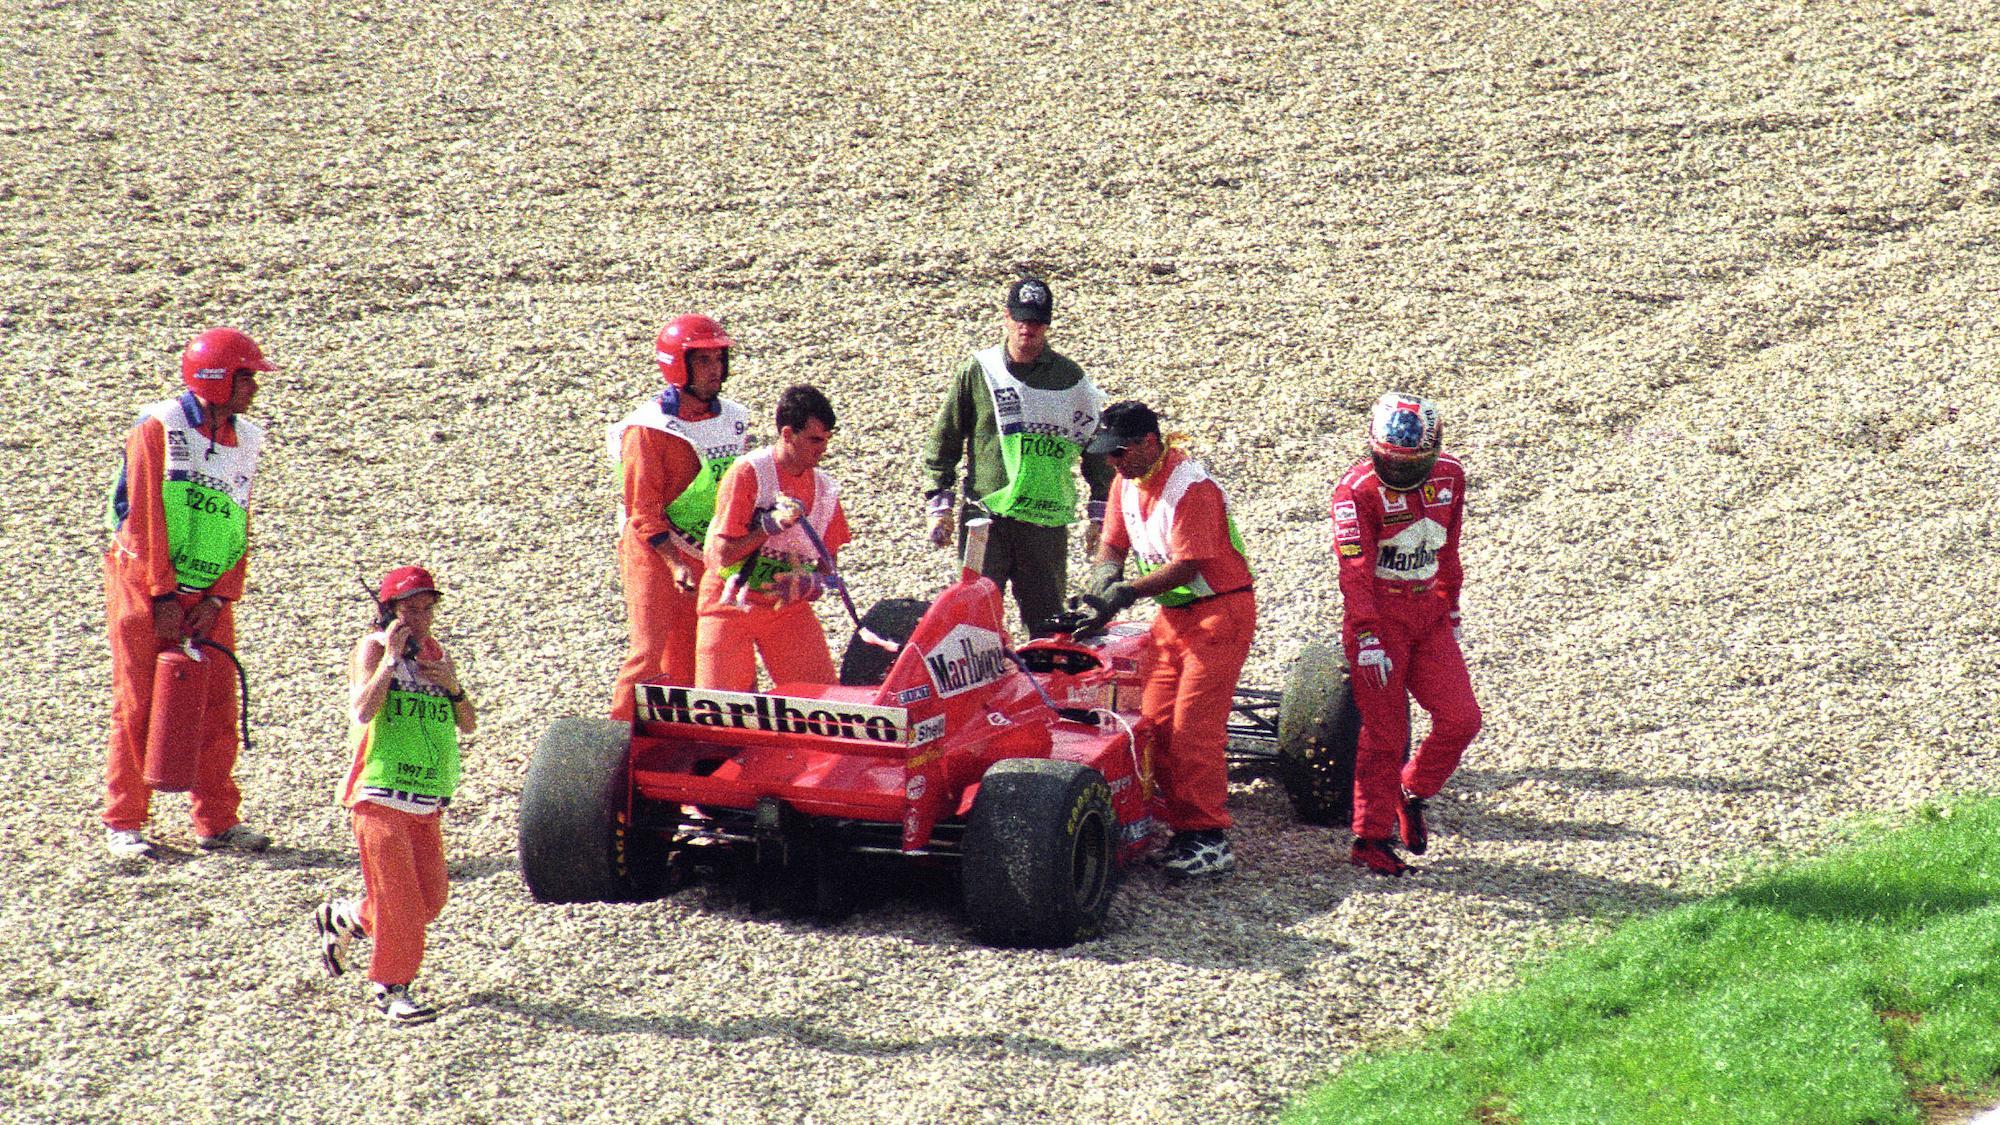 Michael Schumacher, 1997 European Grand Prix